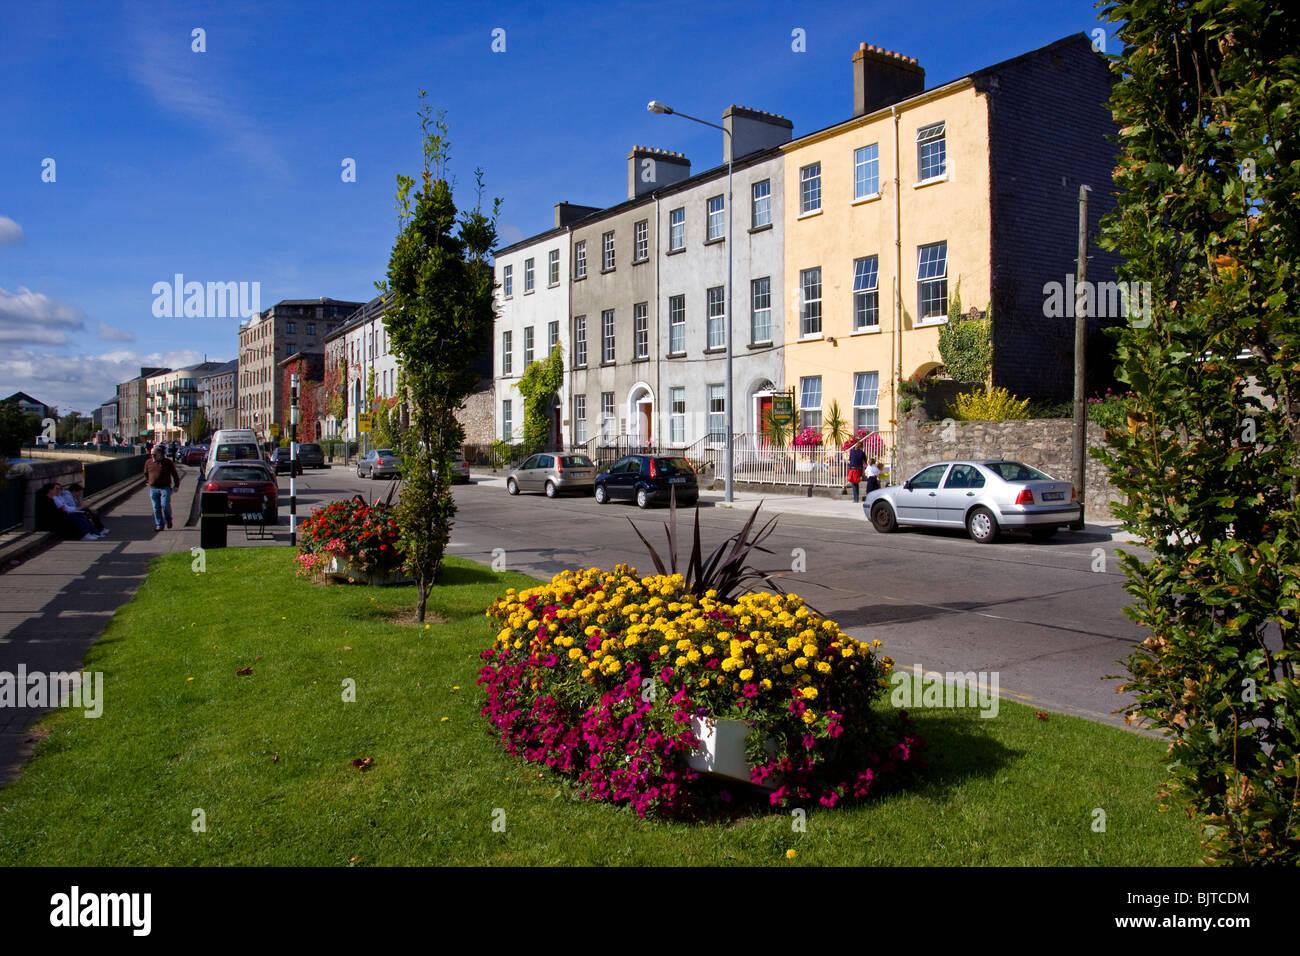 New Quay Clonmel Ireland - Stock Image